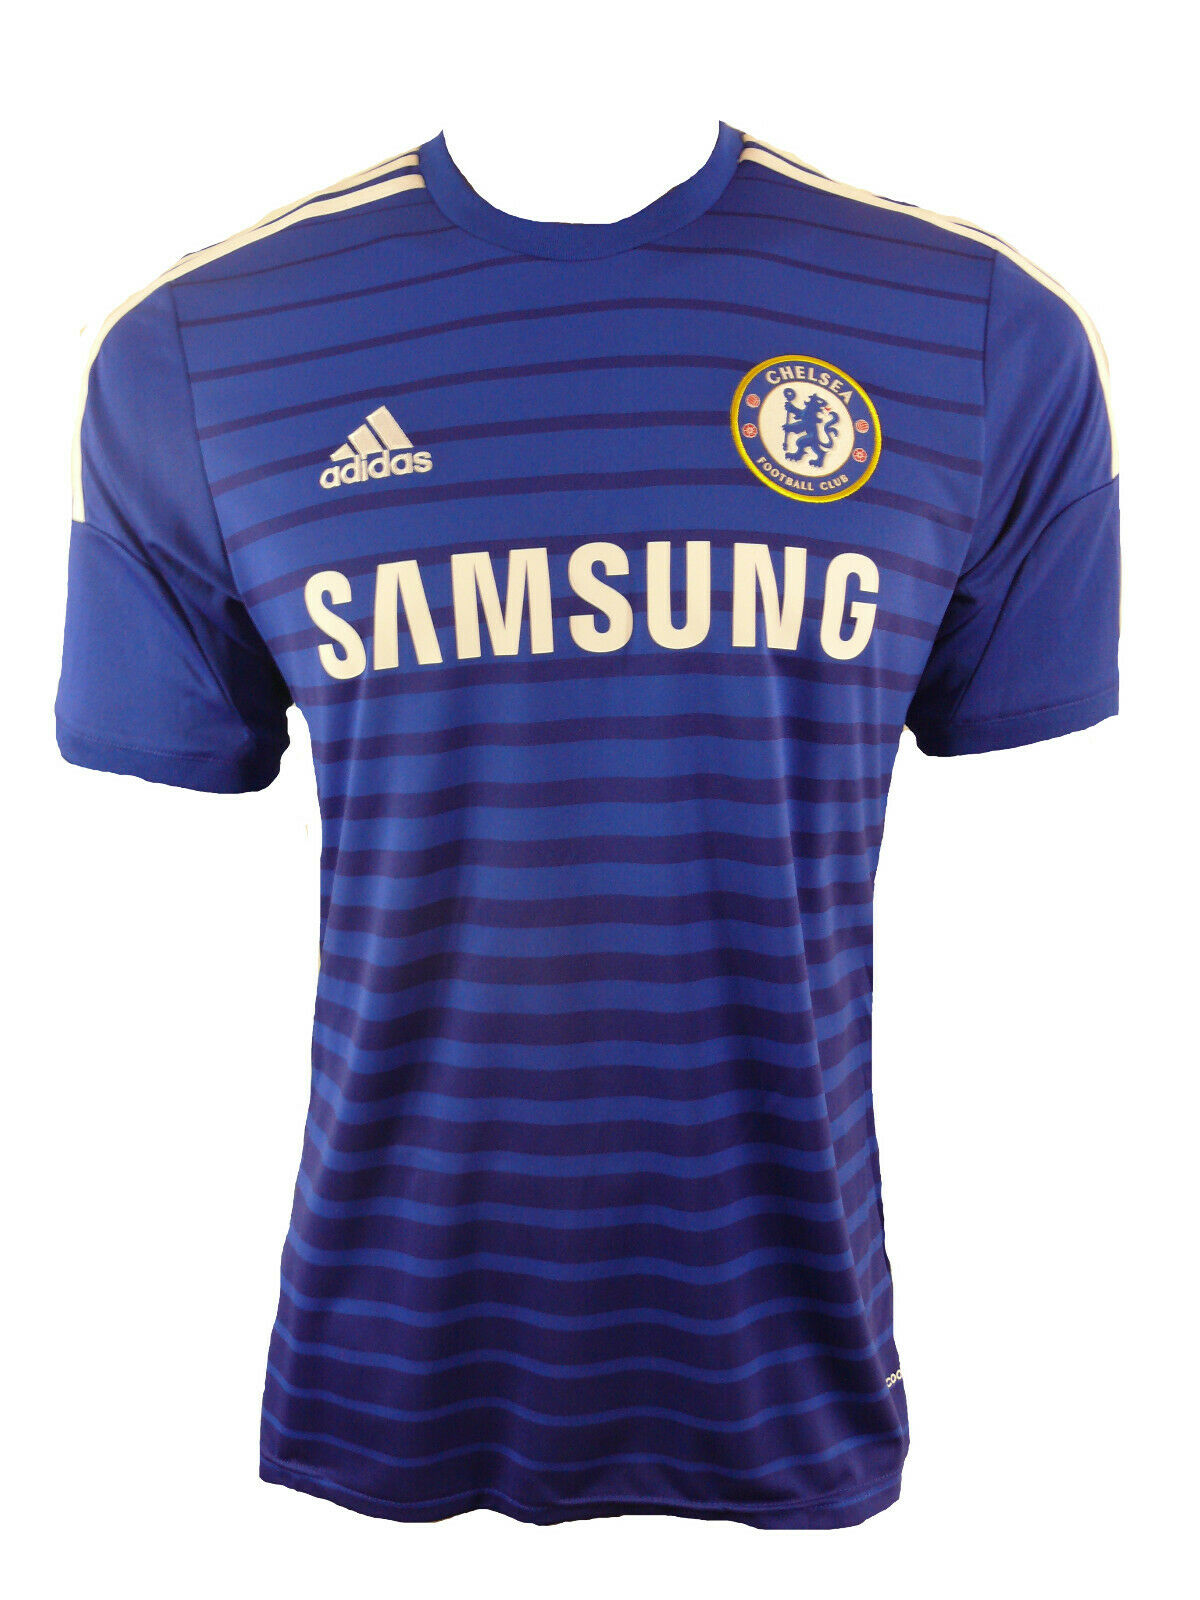 Adidas FC Chelsea London Kinder Jersey Trikot  Gr.140